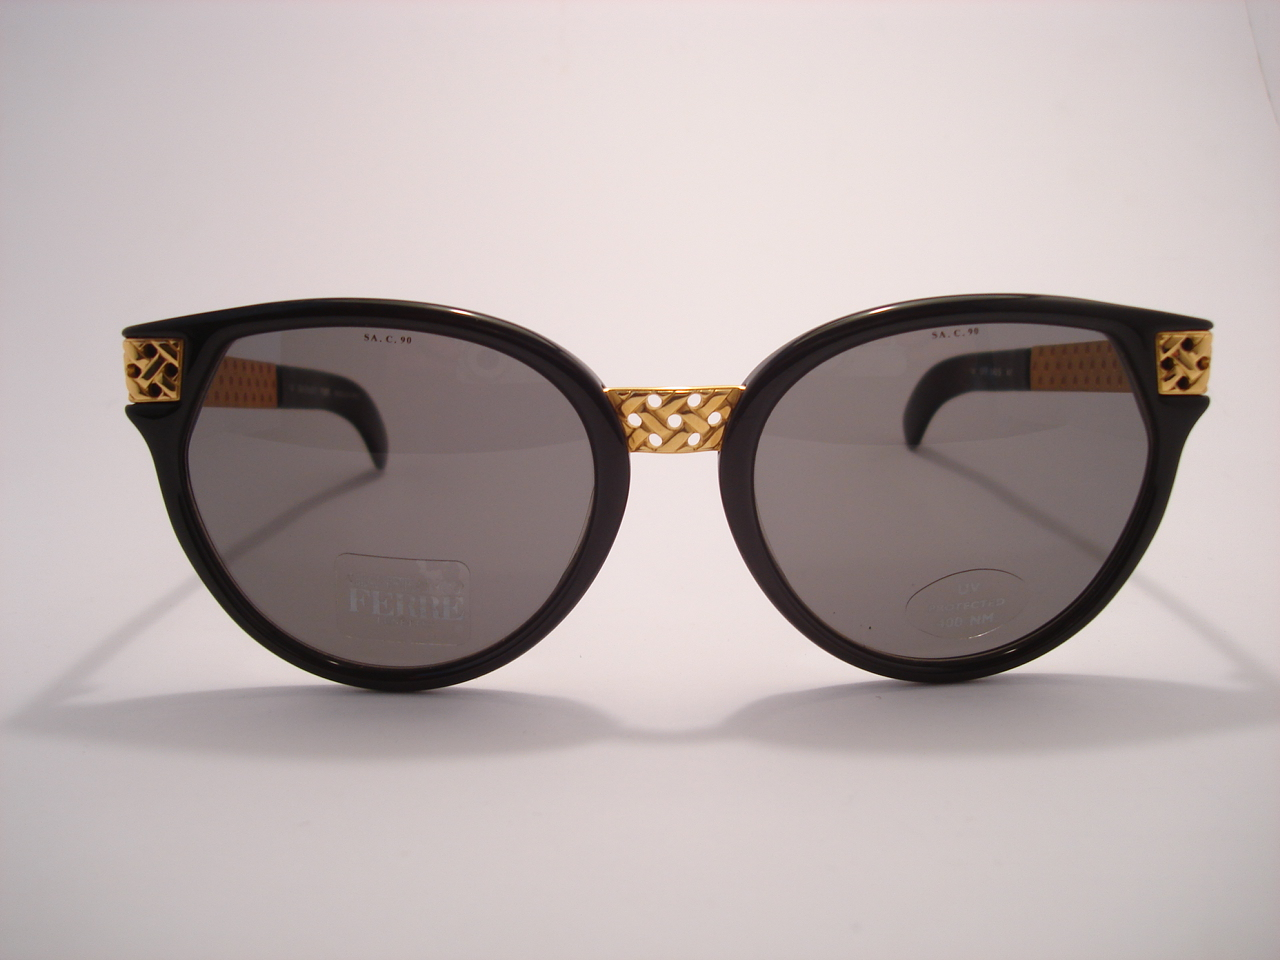 c1b937fc095 Gianfranco Ferre Sunglasses Vintage